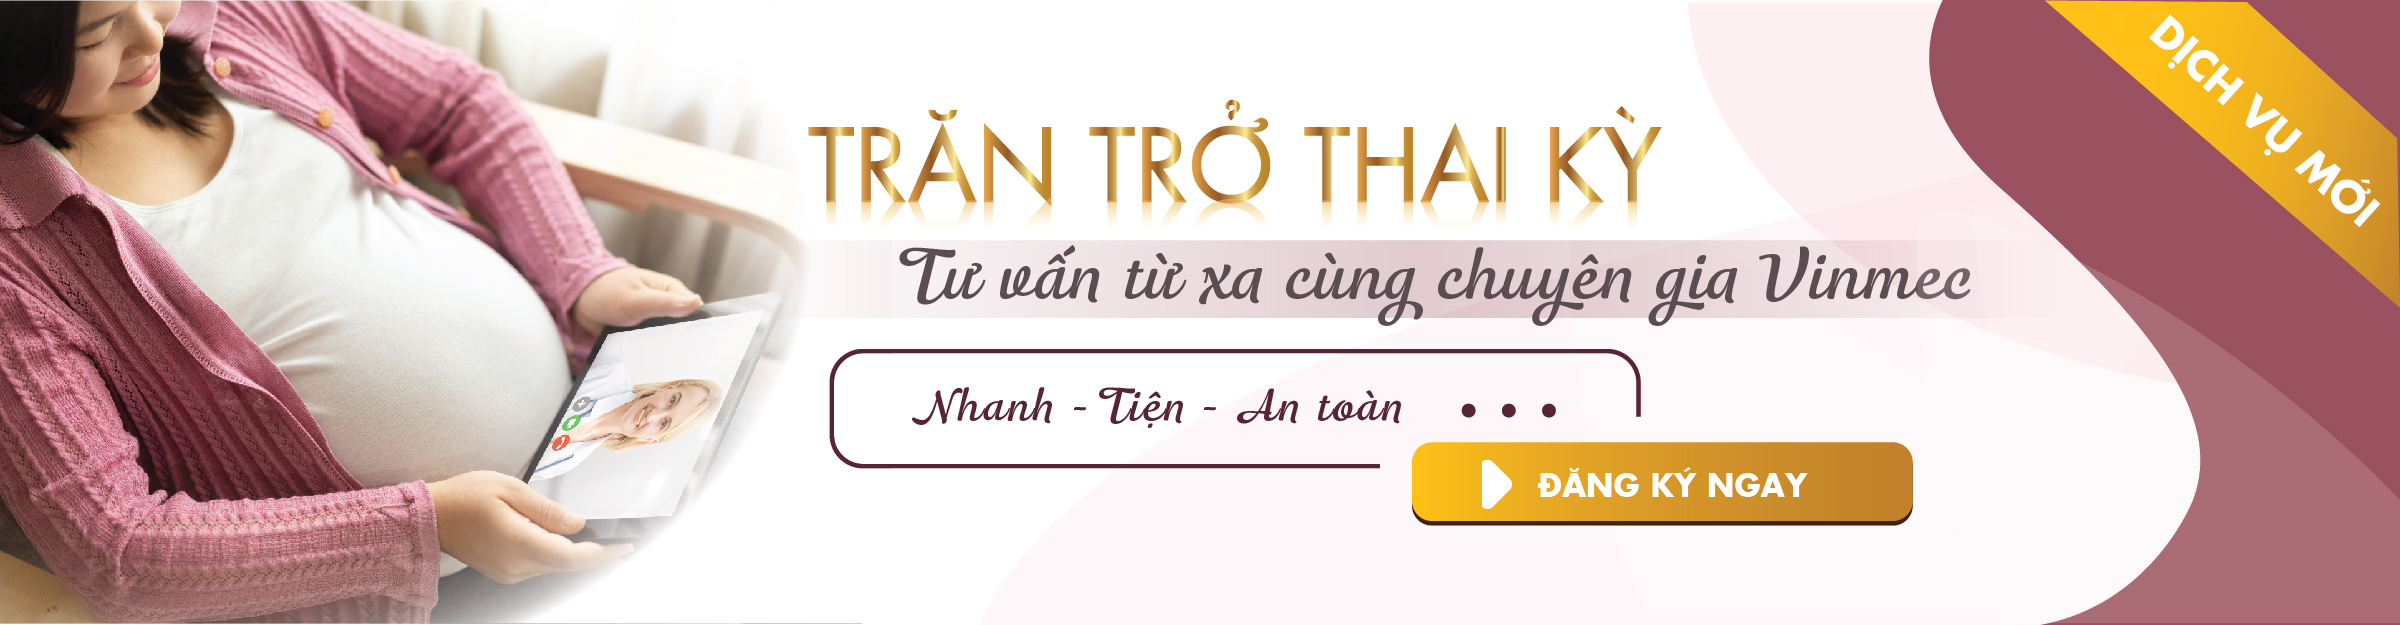 Telehealth_San_Phu_Khoa